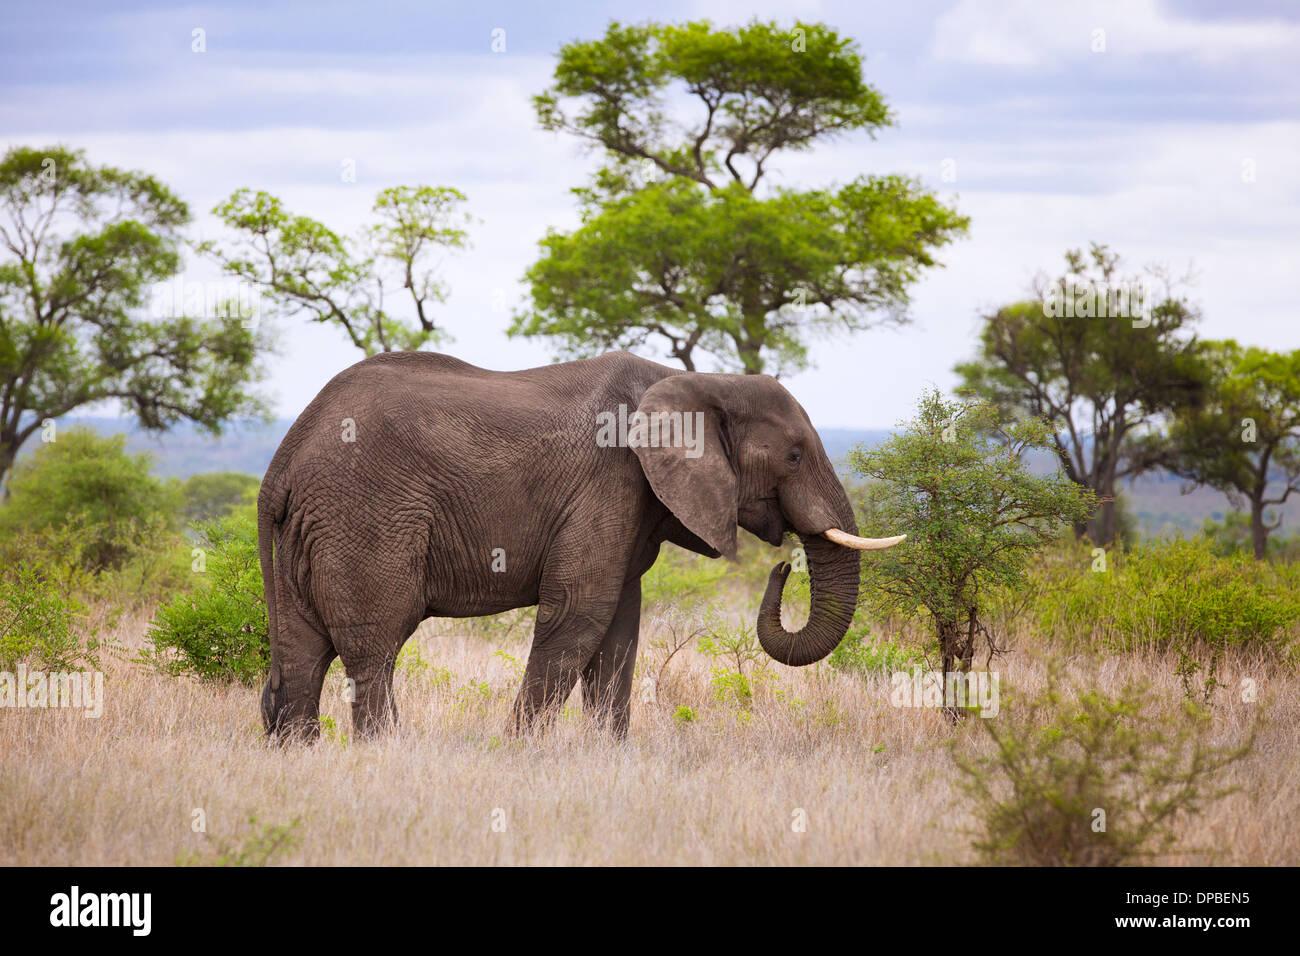 Una Bull Elephant ( Loxodonta africana ) pascolare nel Parco Nazionale di Kruger, Sud Africa. Immagini Stock